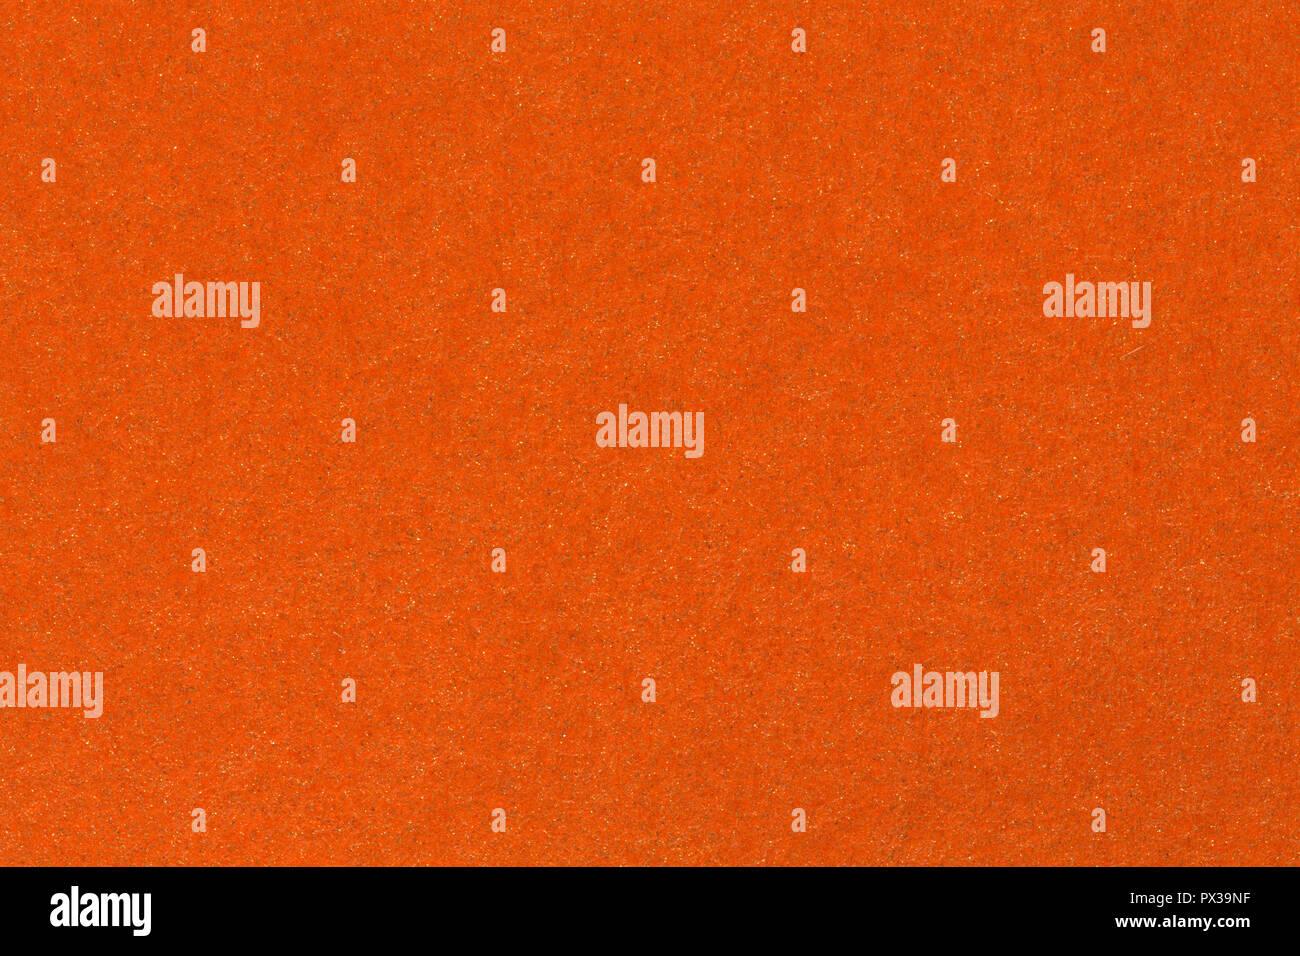 Textura de papel naranja y los fondos. Textura de papel de alta calidad. Imagen De Stock